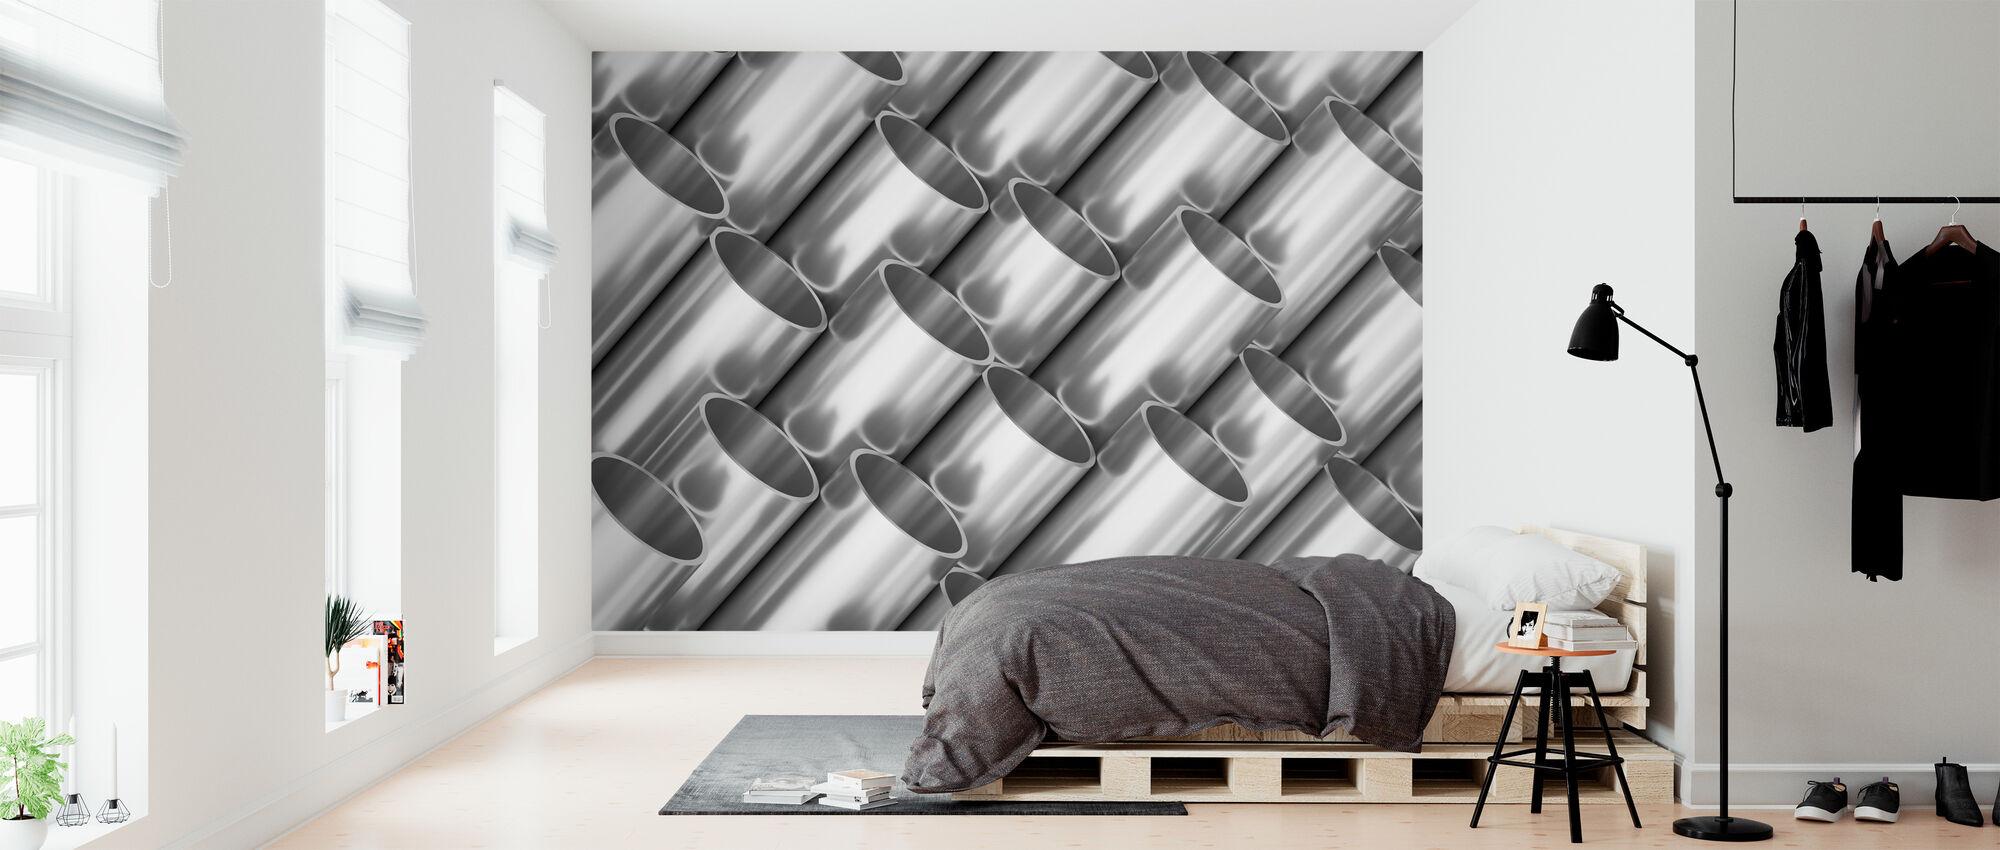 Metal Pipes - Wallpaper - Bedroom